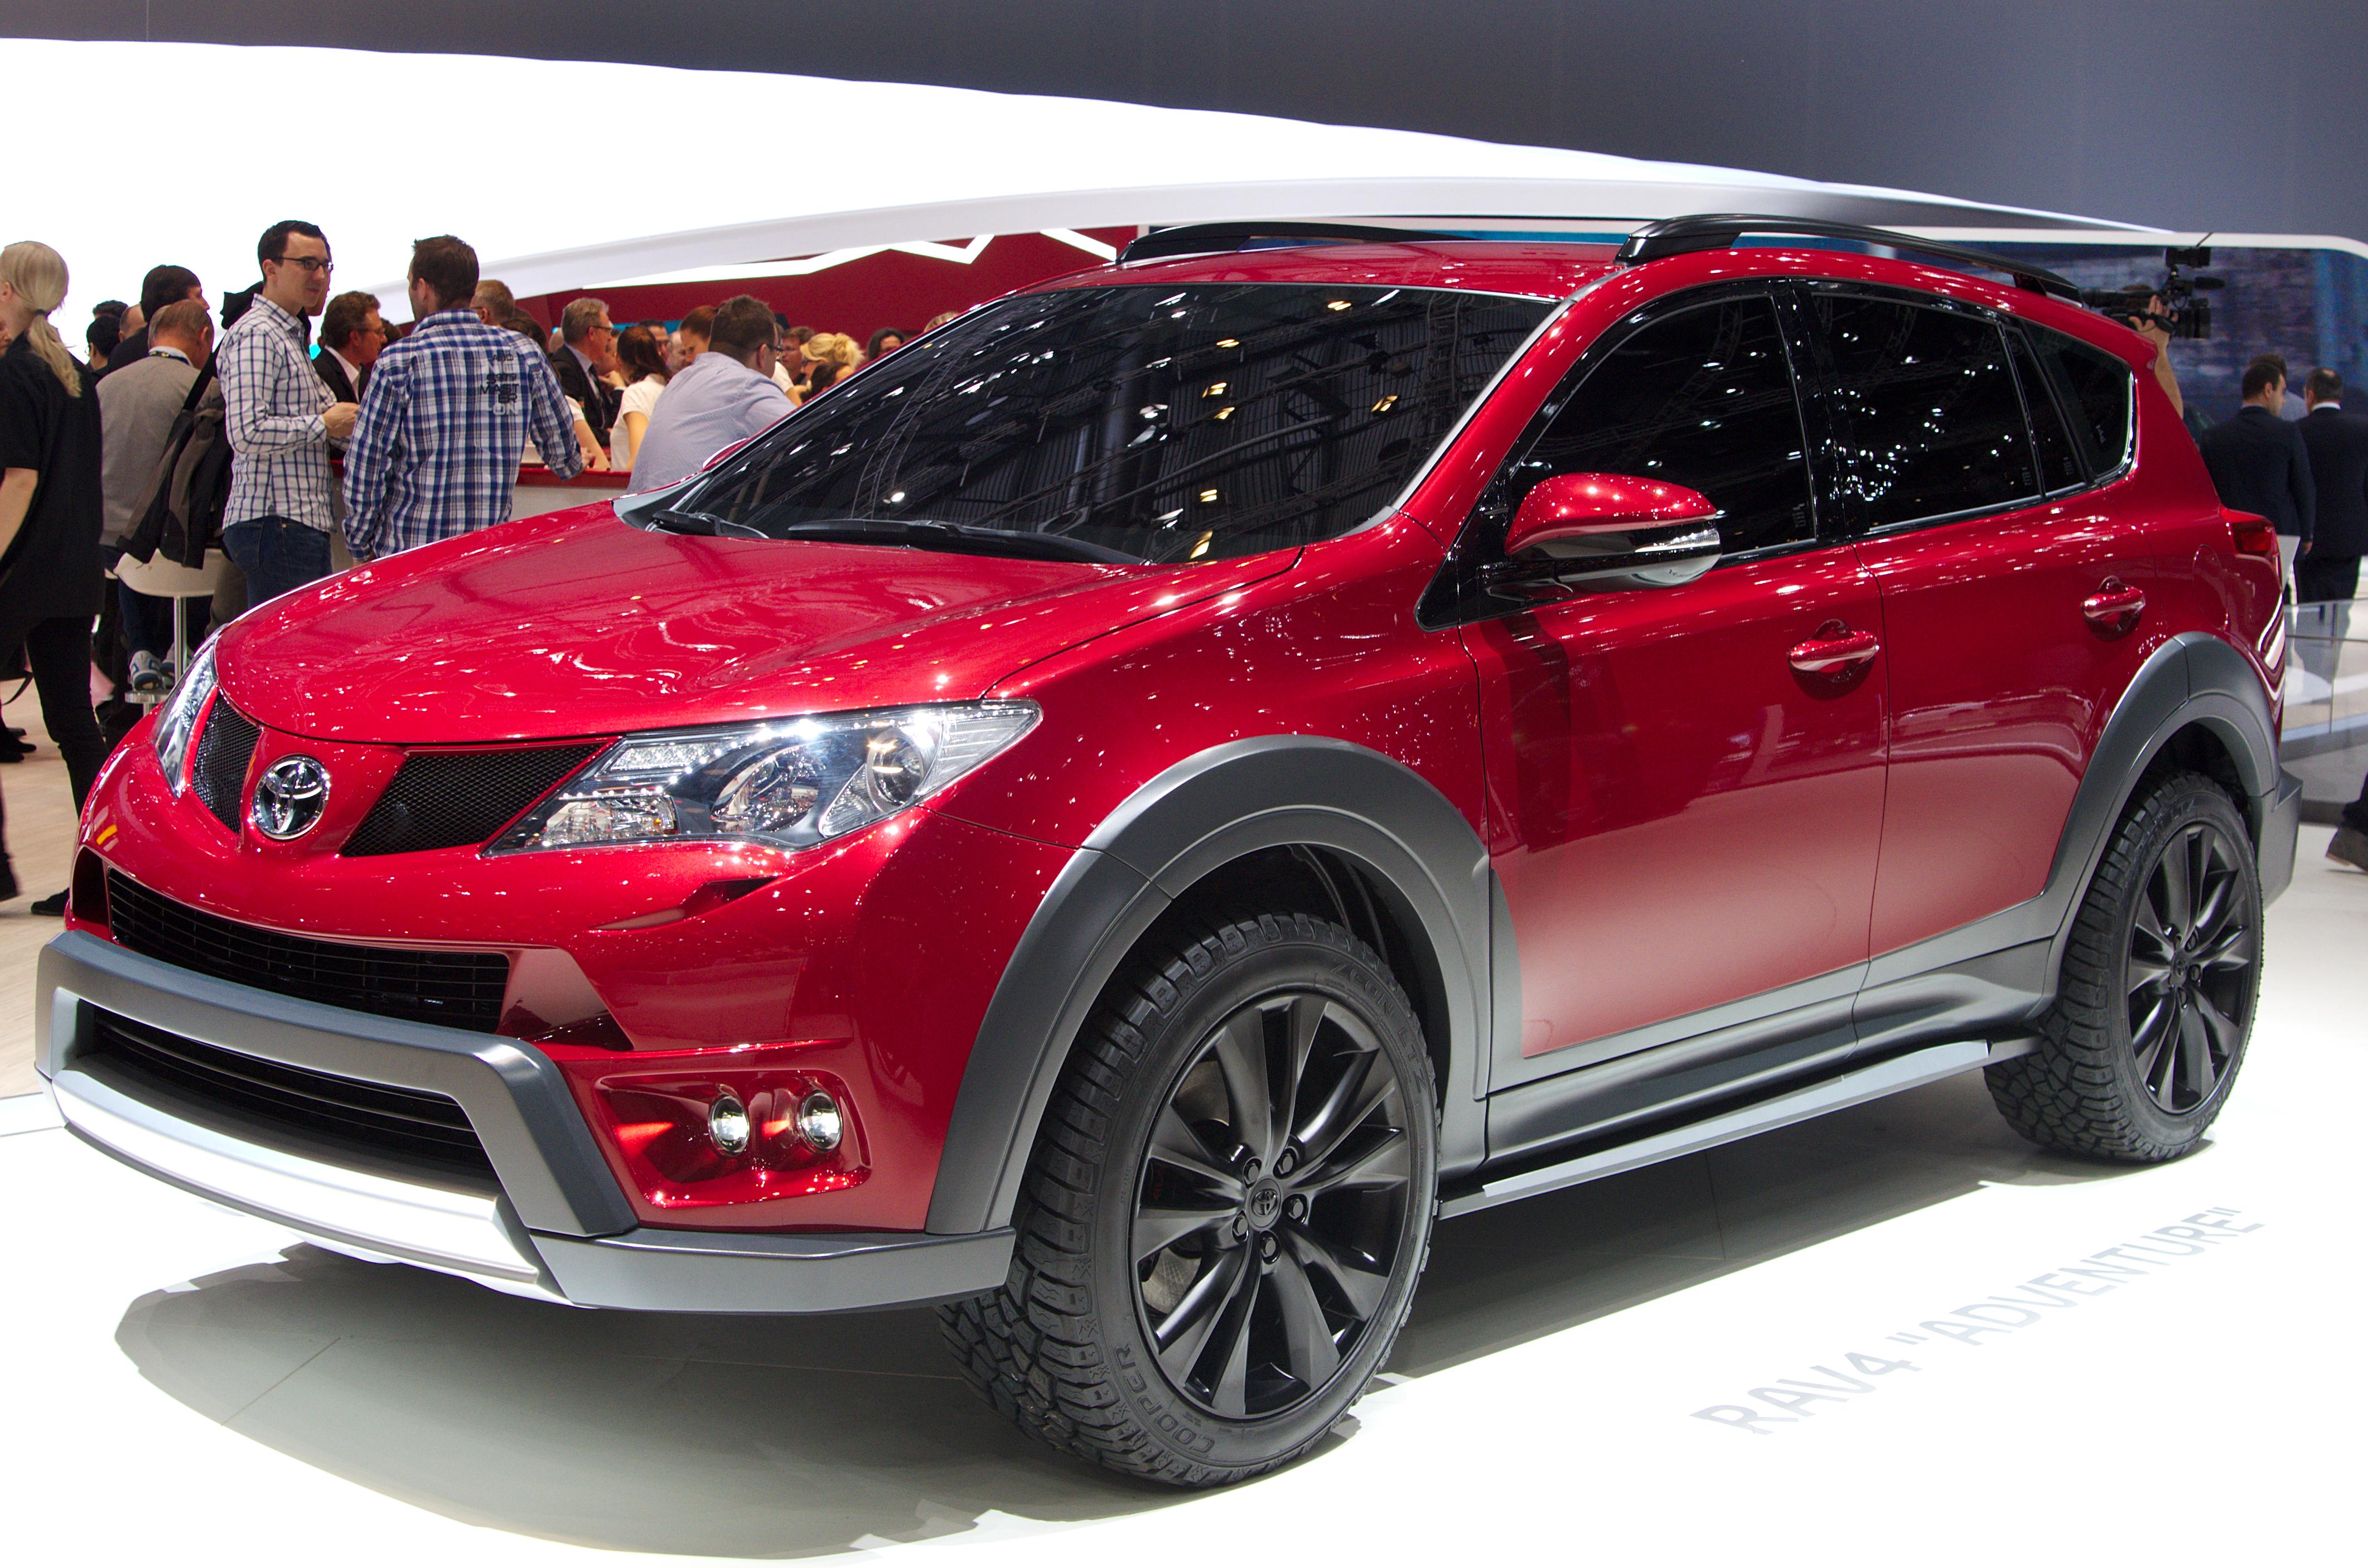 File:Geneva MotorShow 2013 - Toyota RAV4 Adventurer front right view